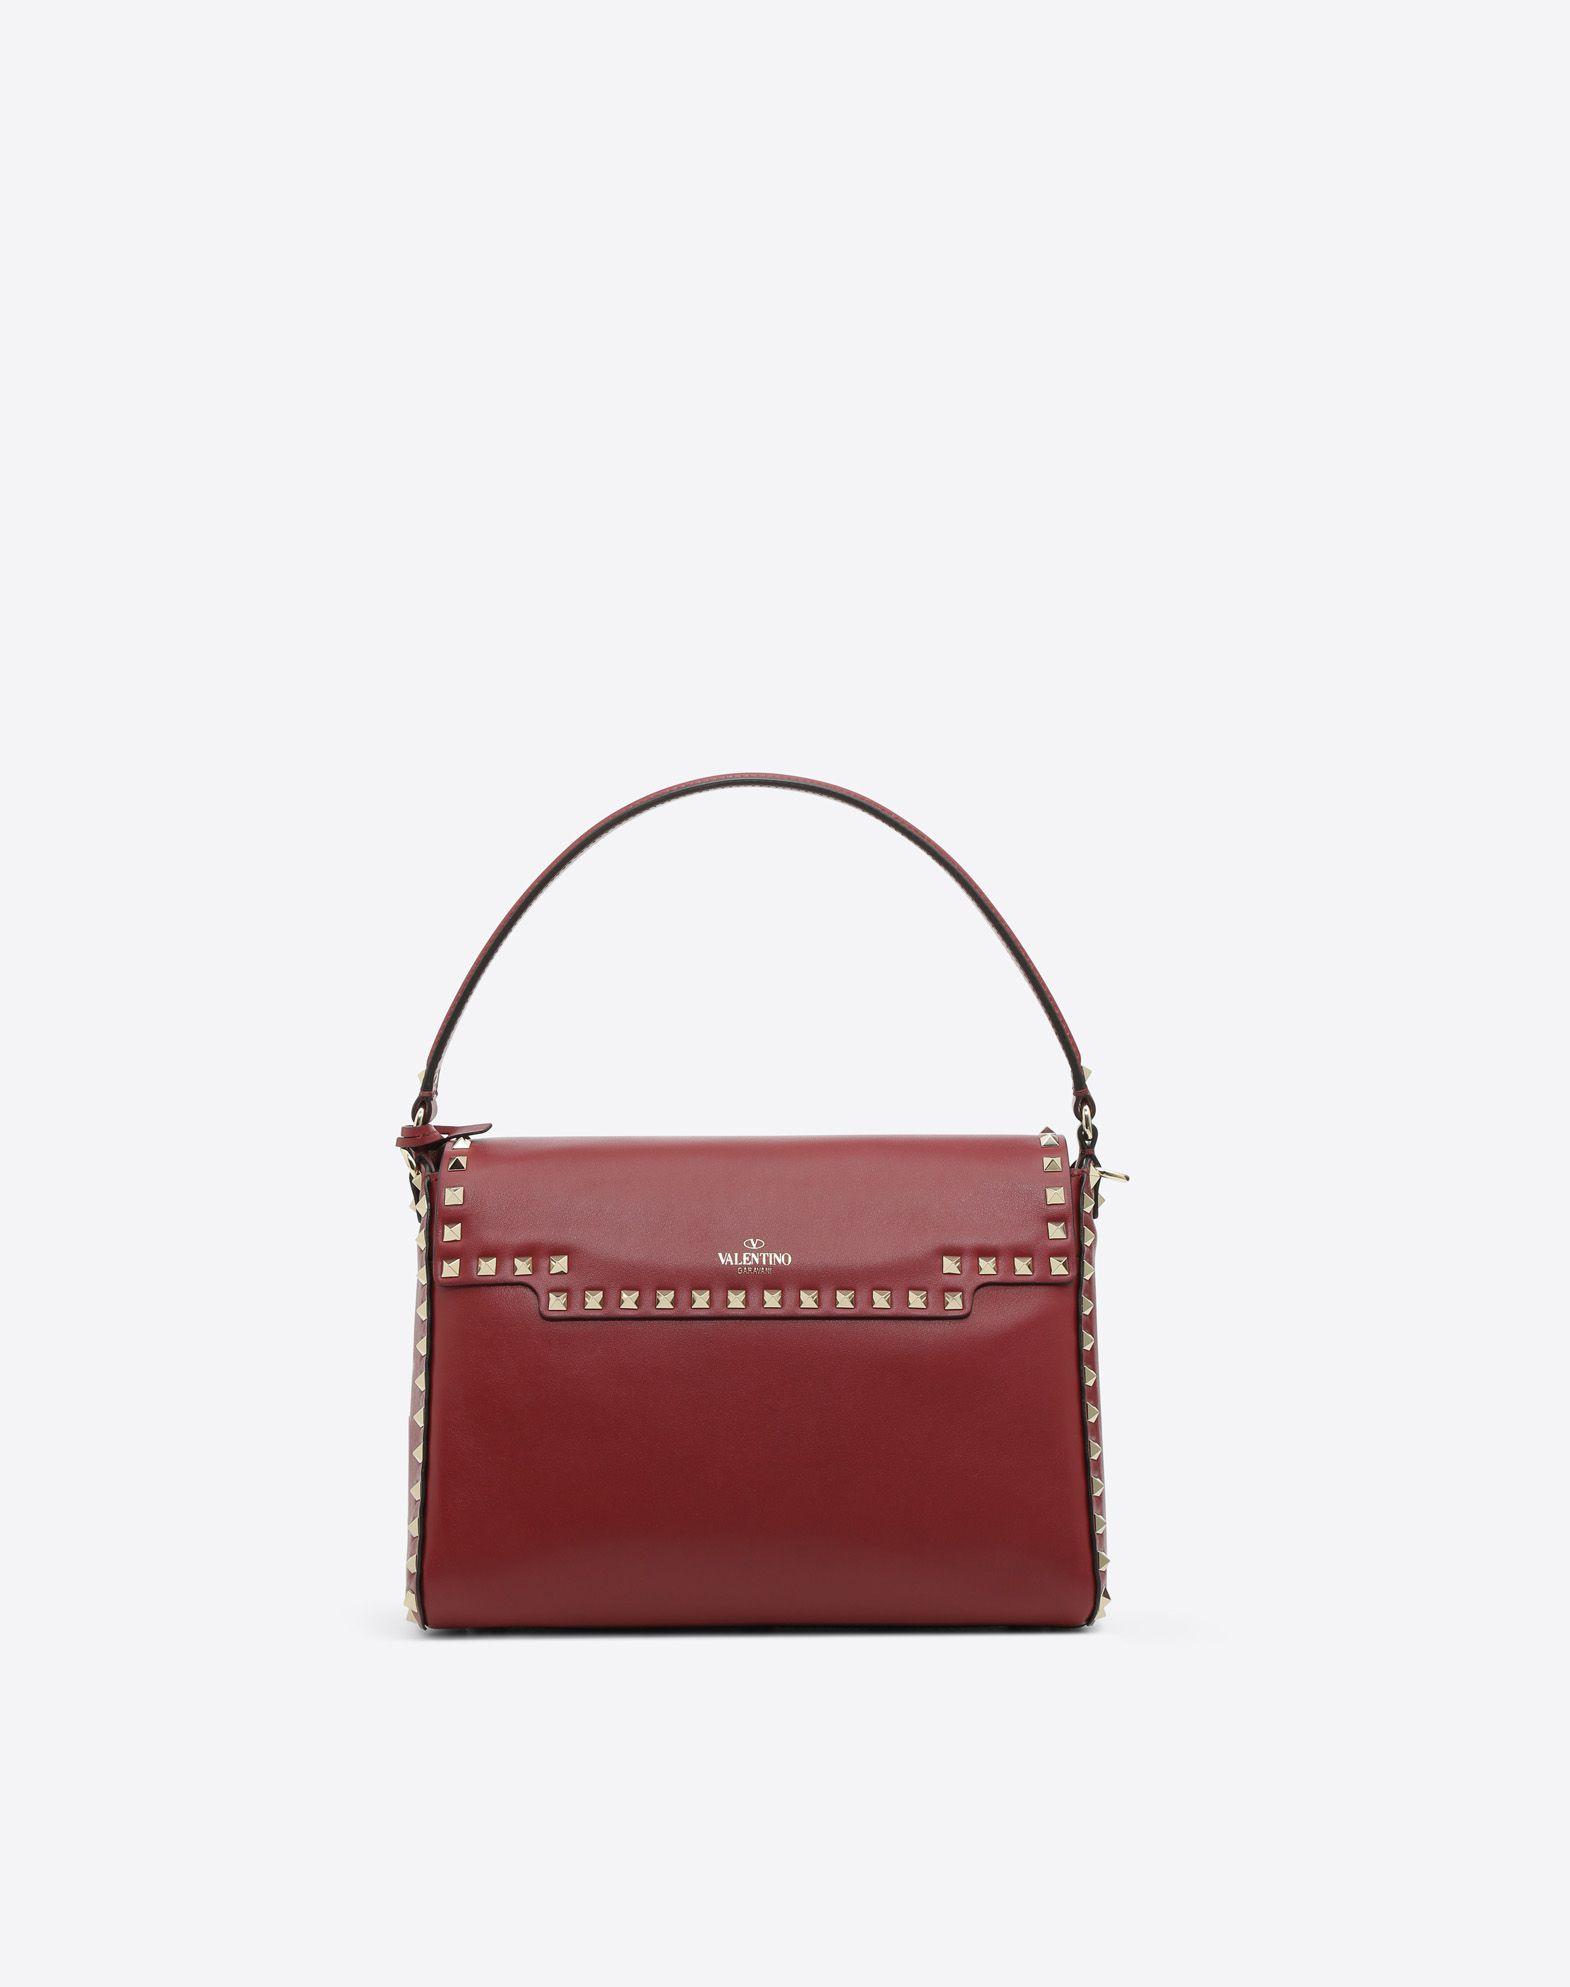 VALENTINO GARAVANI Rockstud Single Handle Bag HANDBAG D d